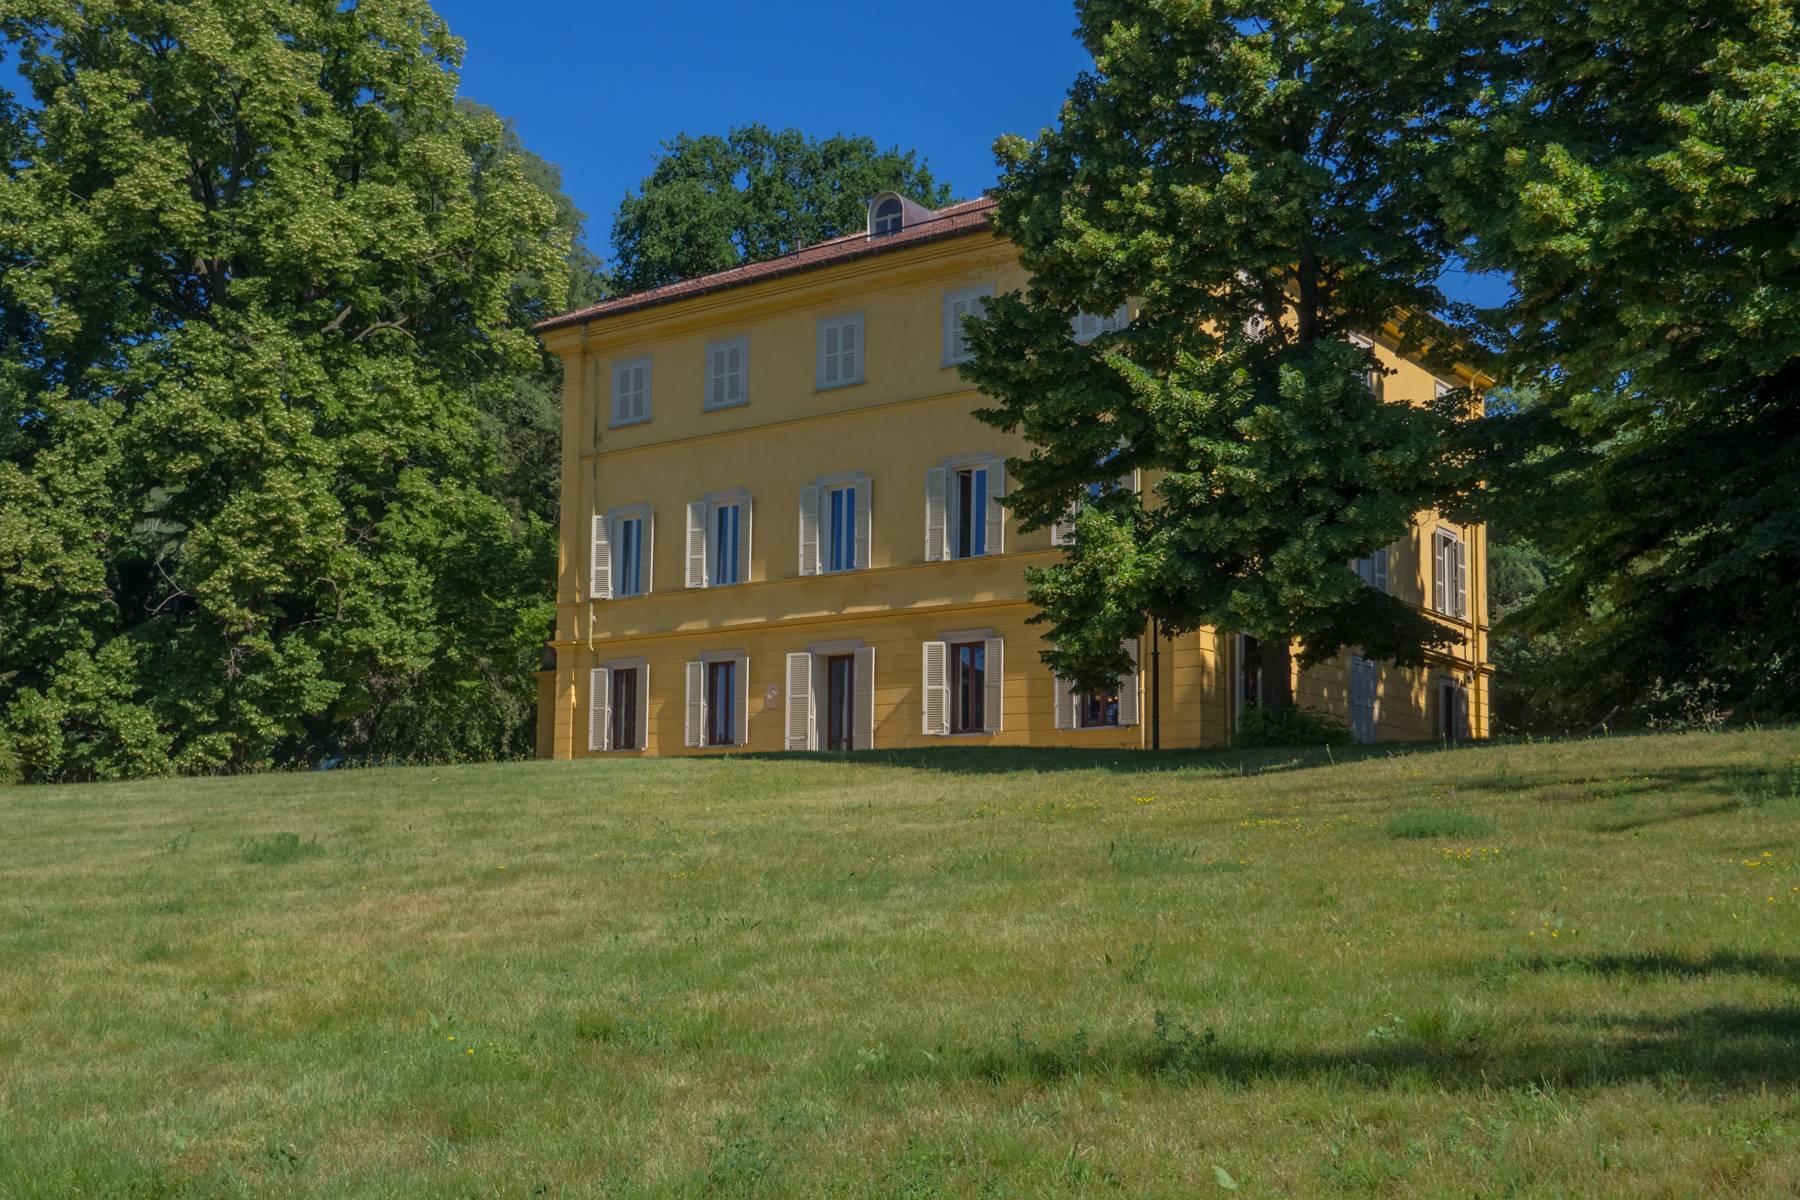 Villa in Vendita a Moncalieri strada castelvecchio